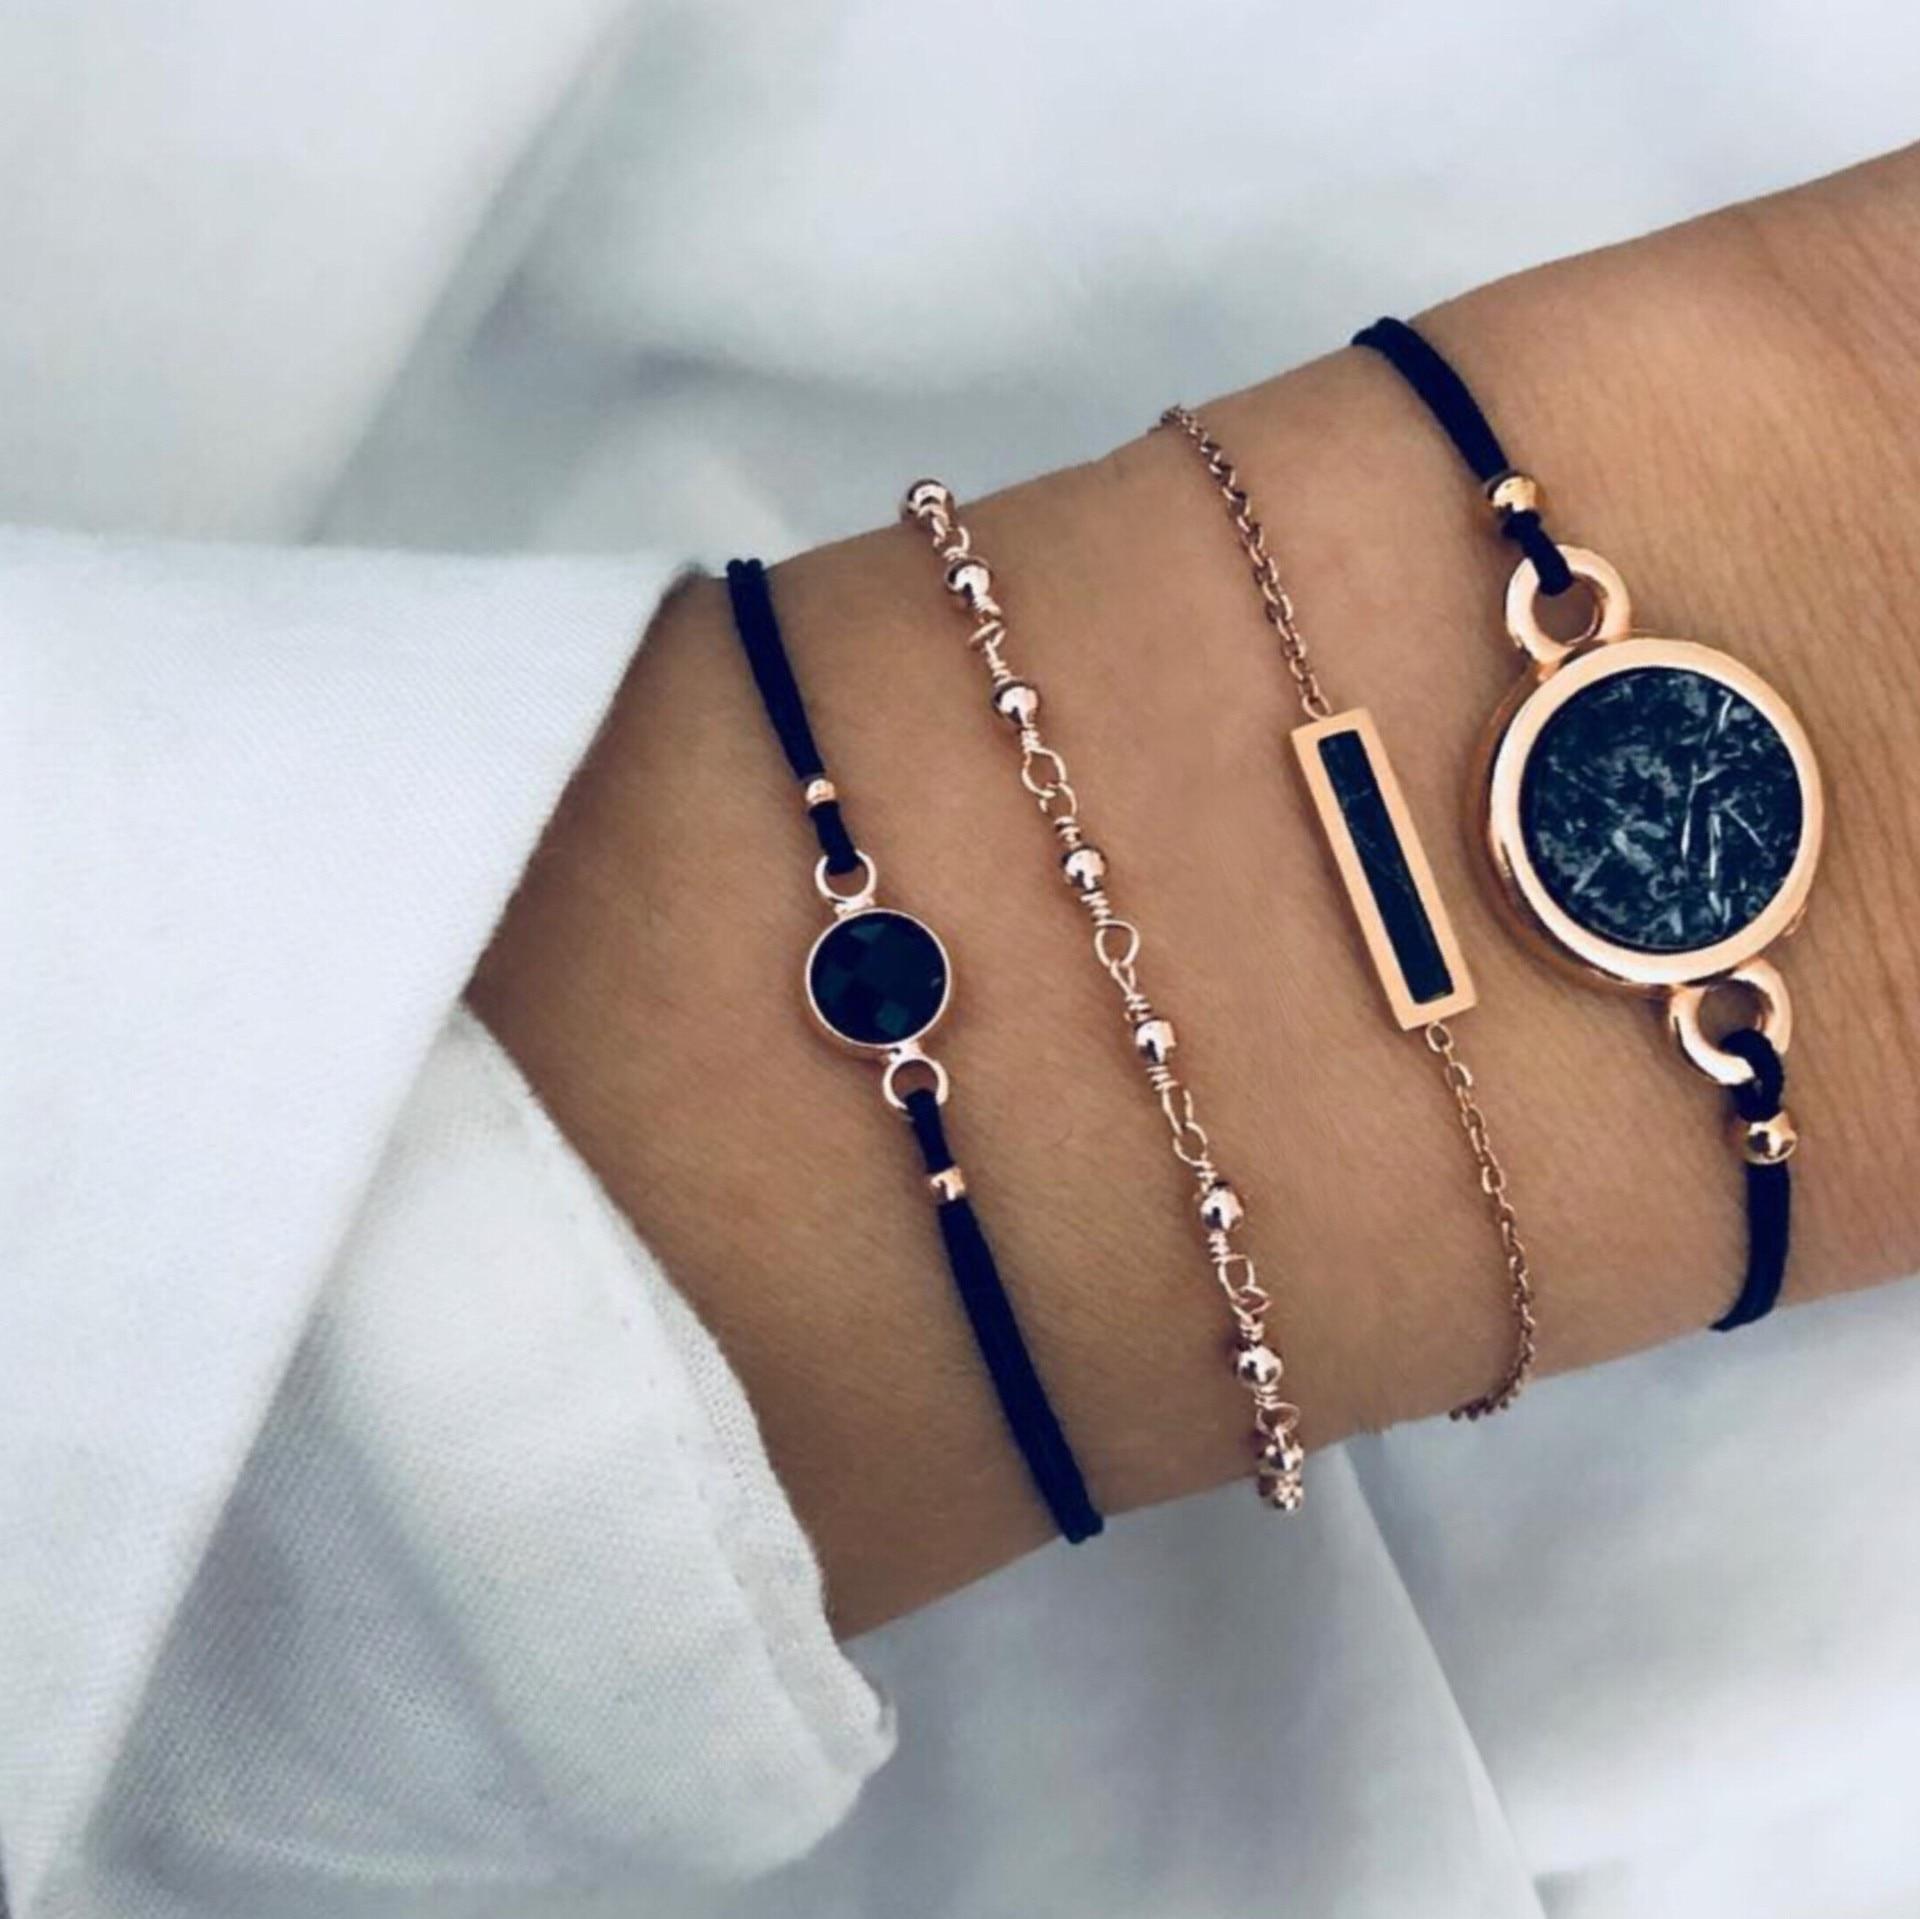 Rinhoo Bohemian Retro Resin Stone Charm Bracelet Sets Lotus Heart Moon Map Triangle Pendant Women Men Summer Ocean Style Jewelry